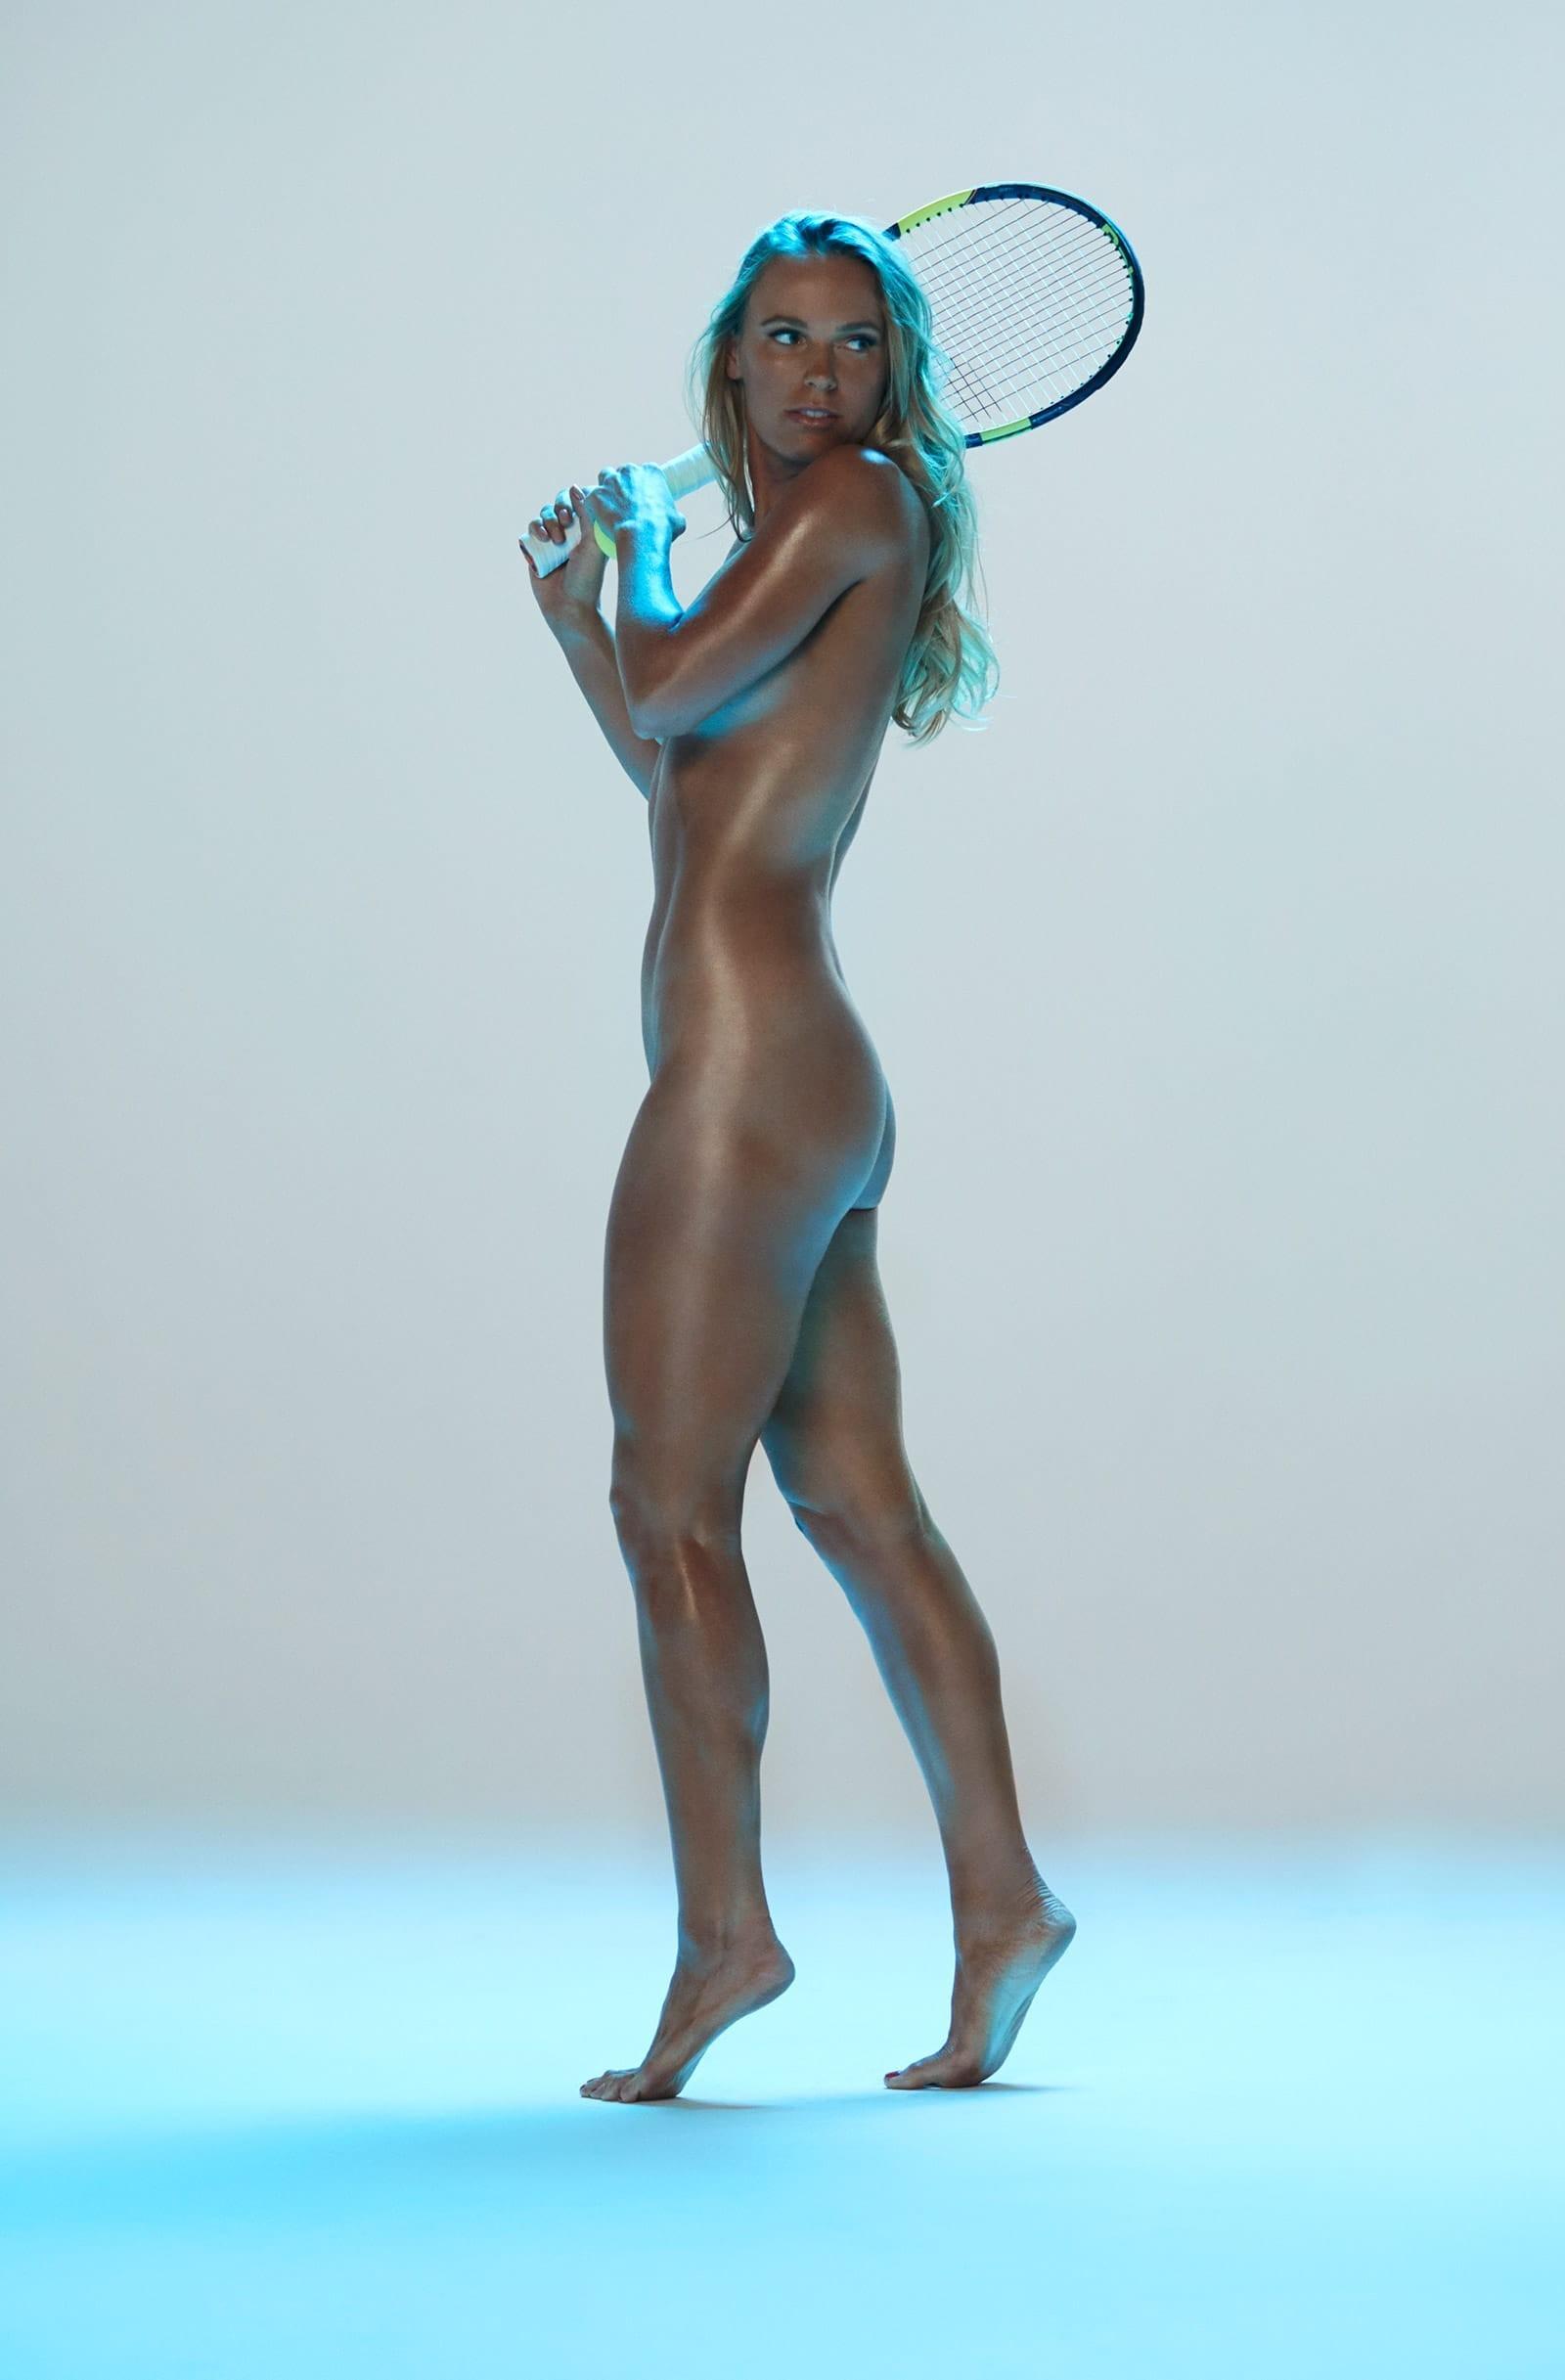 Caroline Wozniacki se desnuda para recibir Wimbledon